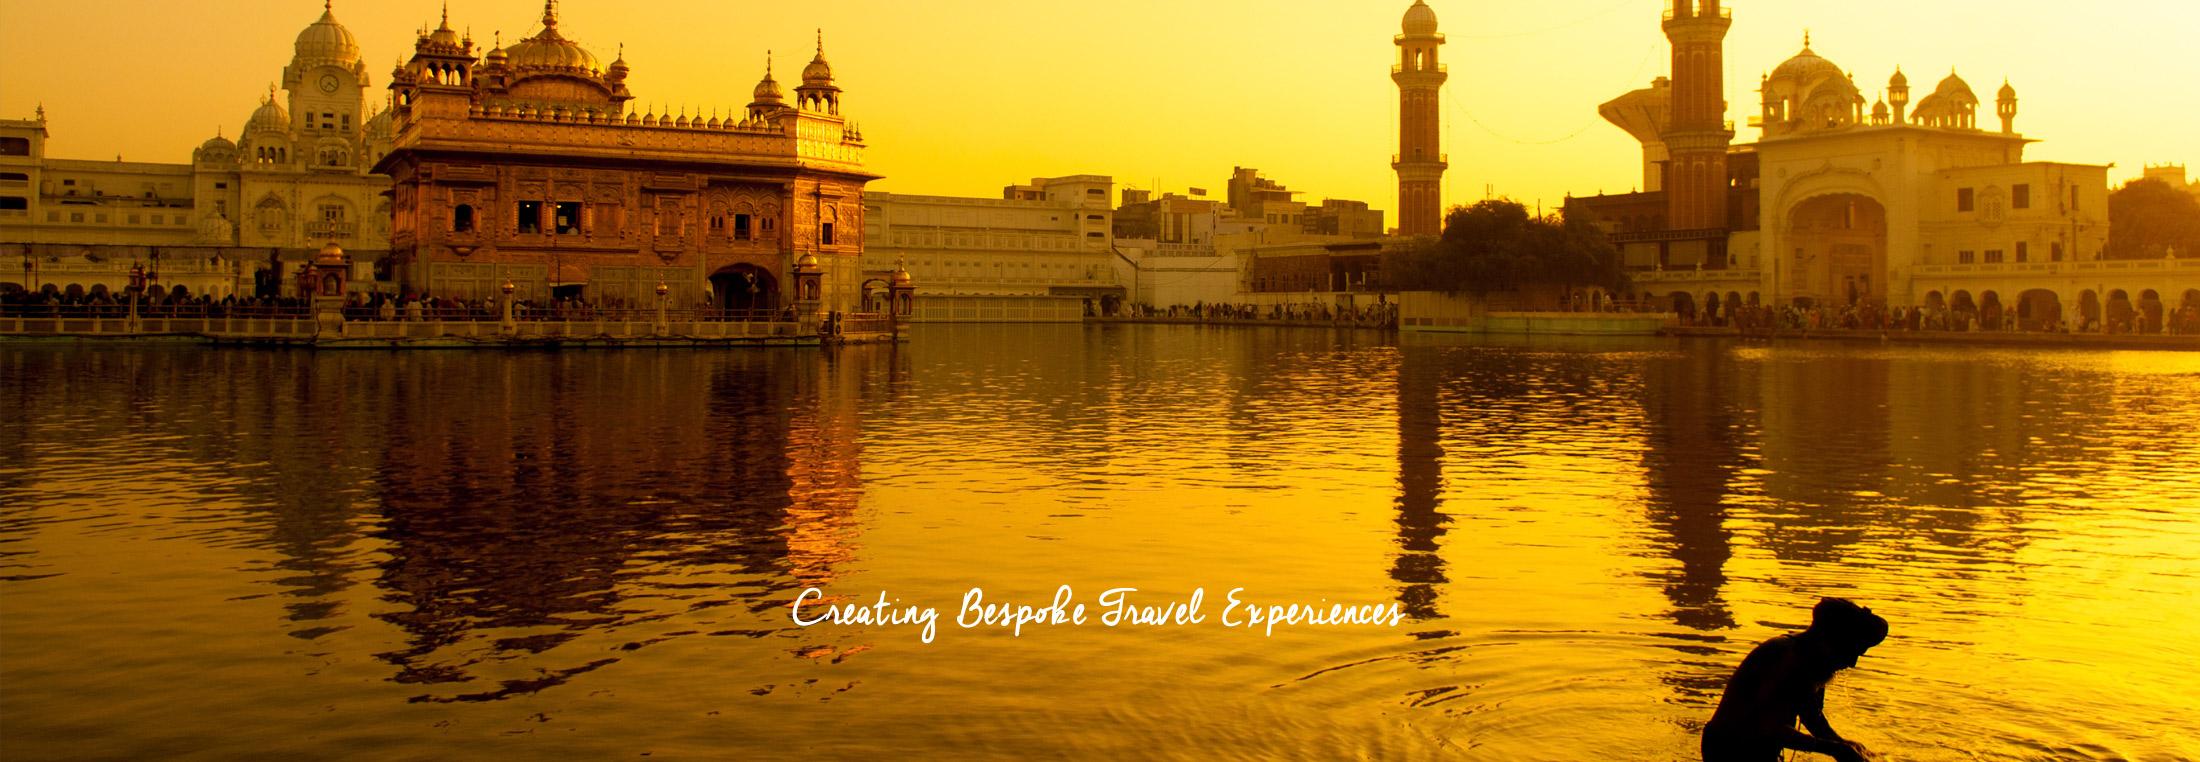 Bespoke Travel Experiences